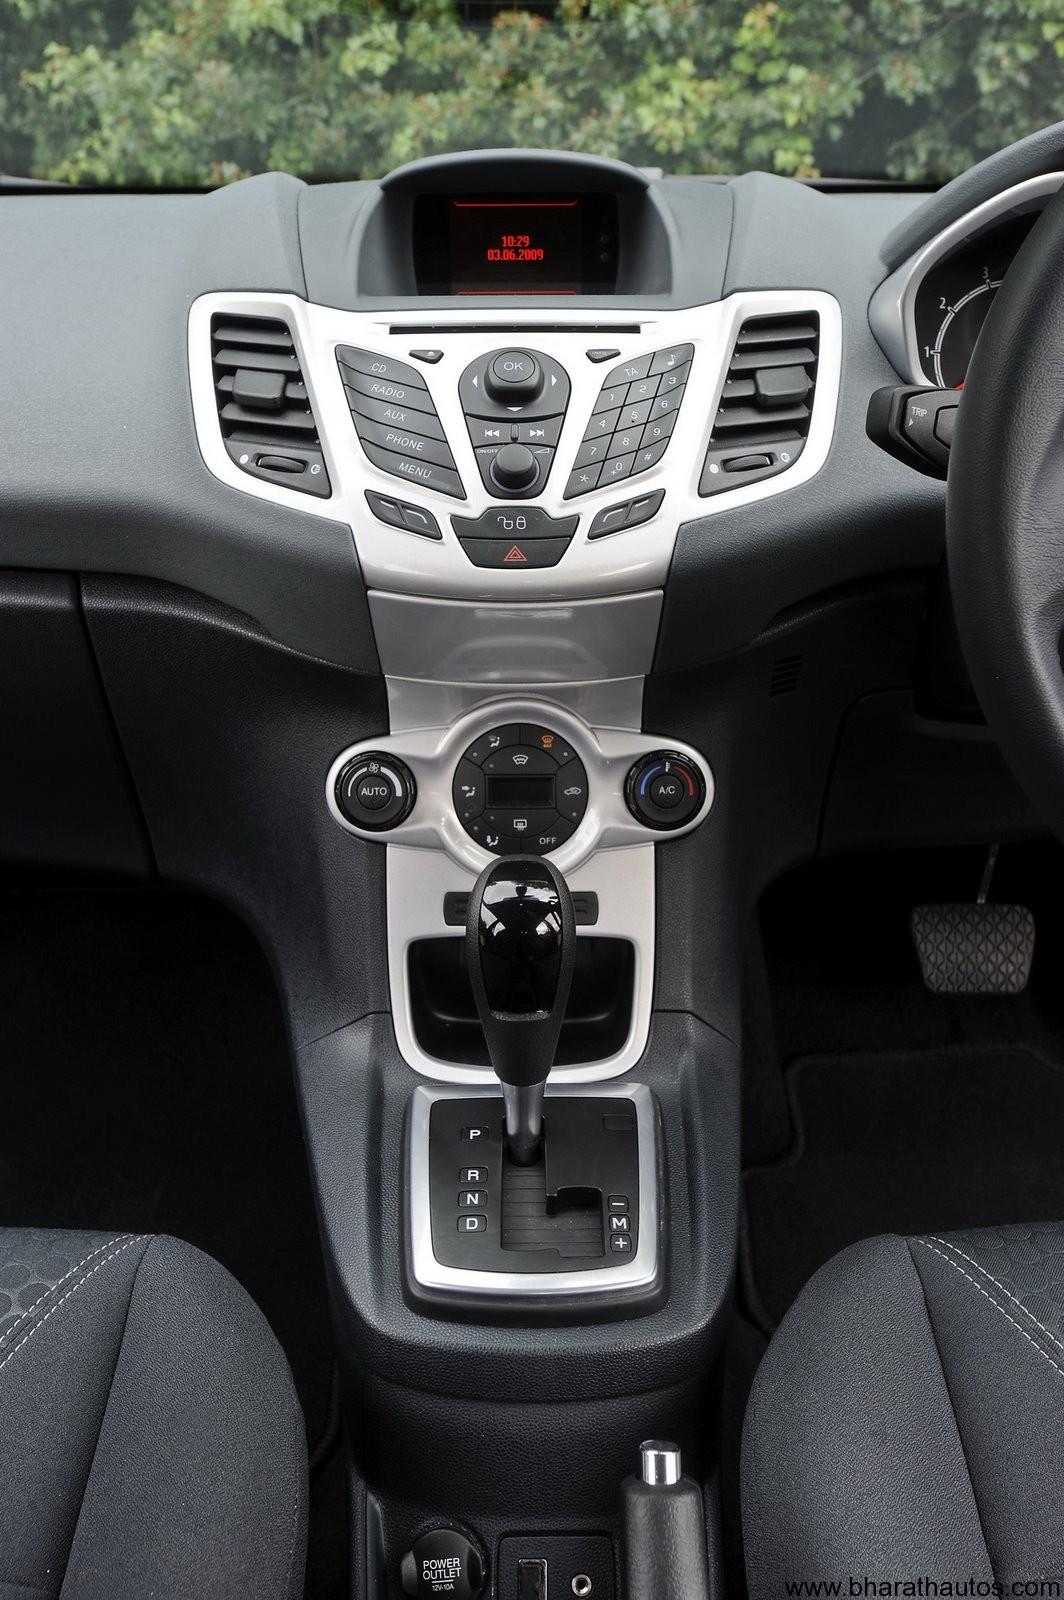 2012 Ford Fiesta Automatic sedan